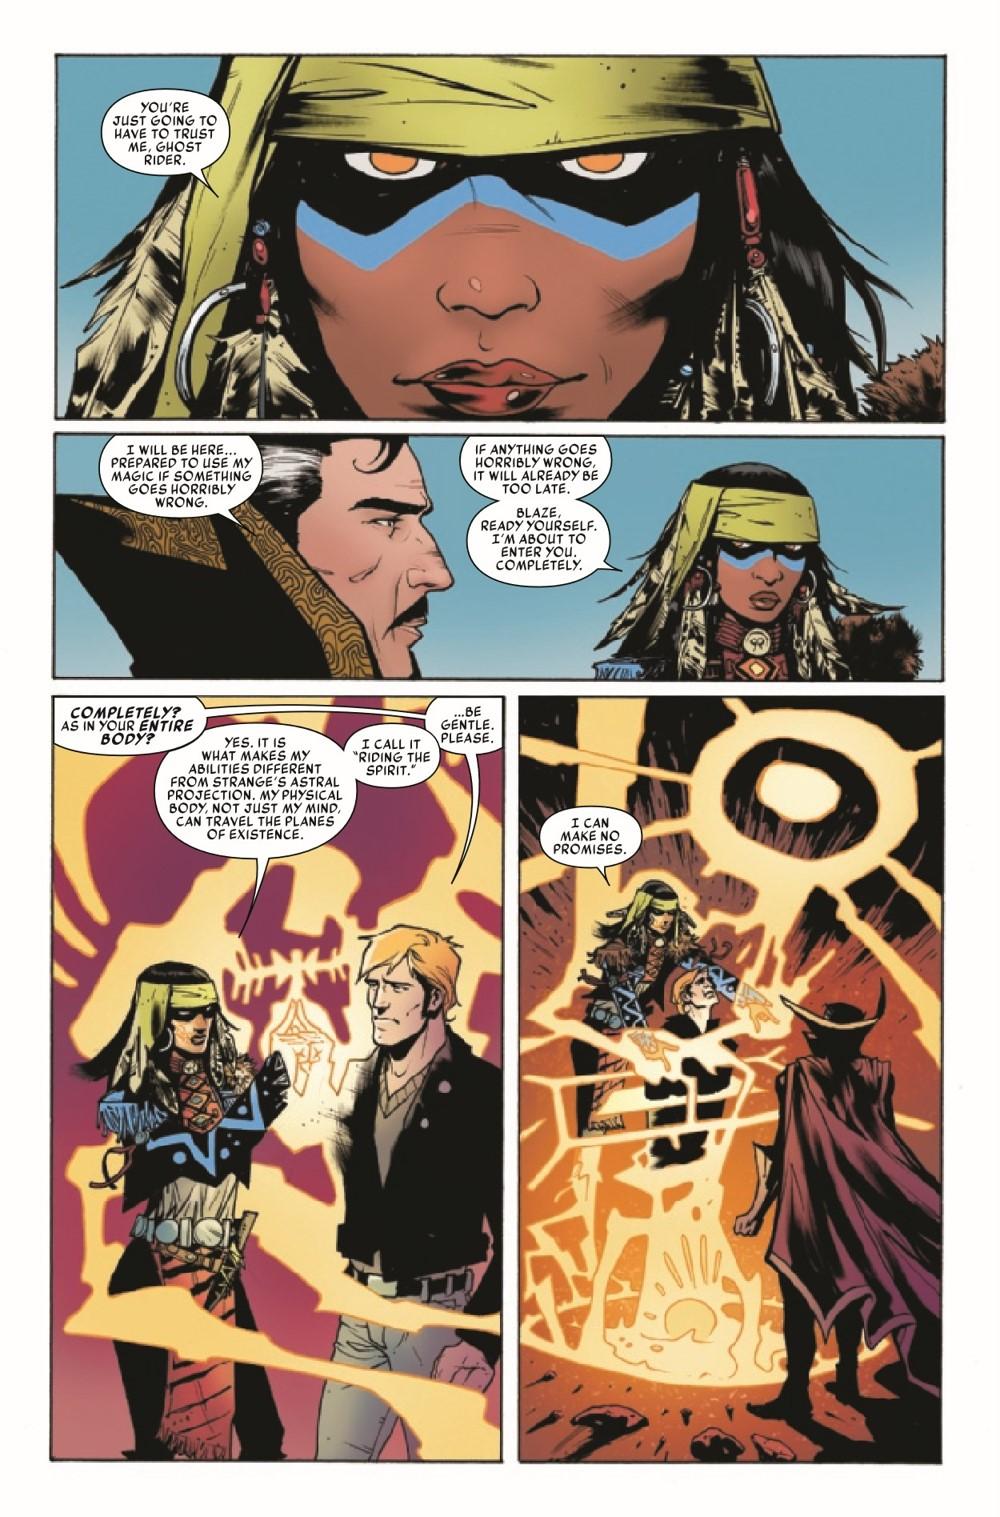 SOVSPRIDER2021001_Preview-6 ComicList Previews: SPIRITS OF VENGEANCE SPIRIT RIDER #1